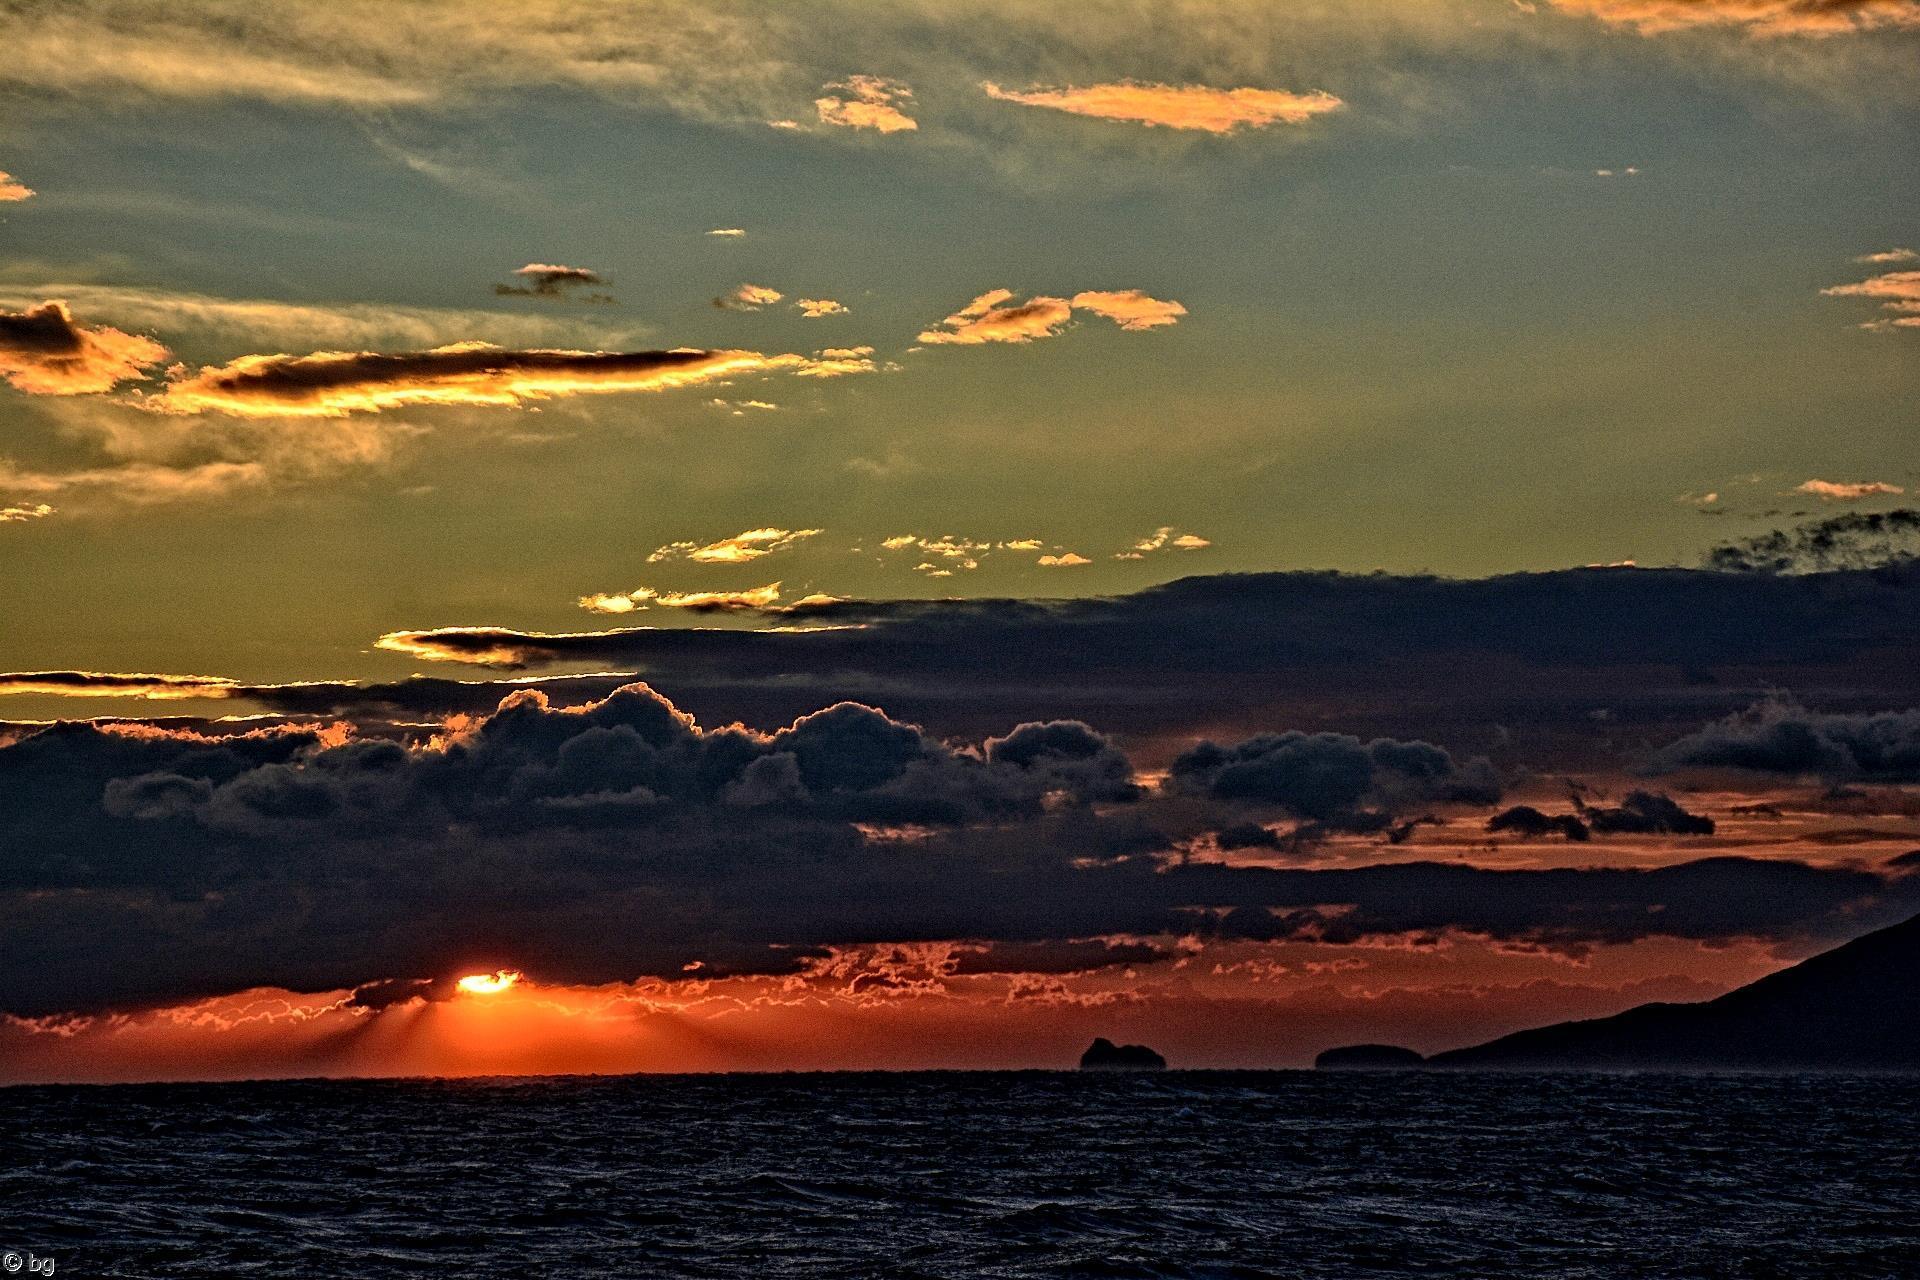 fonds-ecran-HD-coucher-du-soleil_1